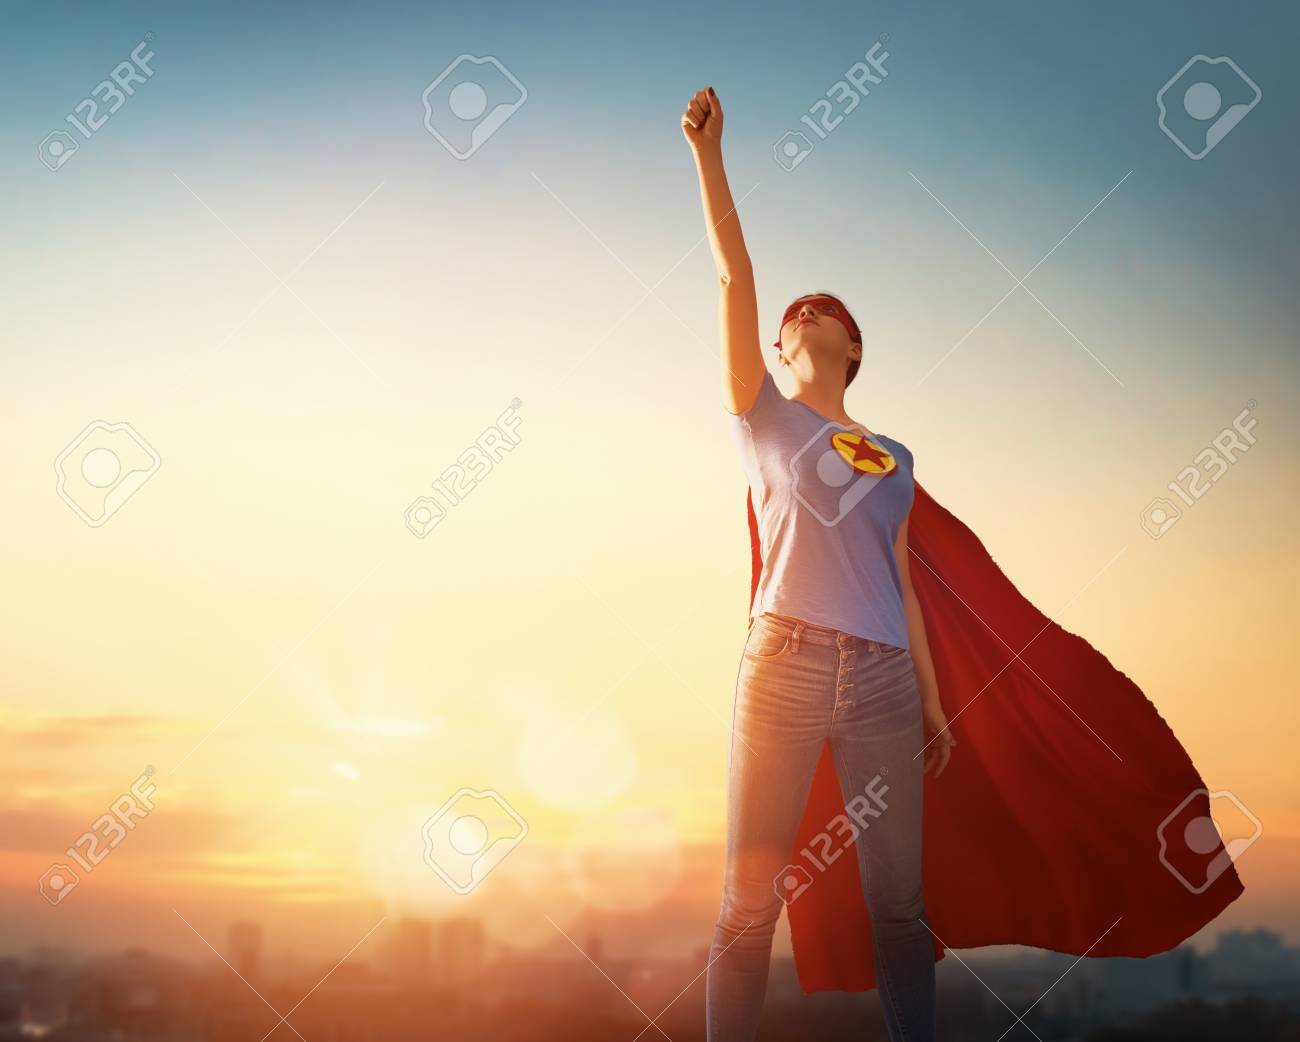 Joyful beautiful young woman in superhero costume posing on sunset background. - 117202637